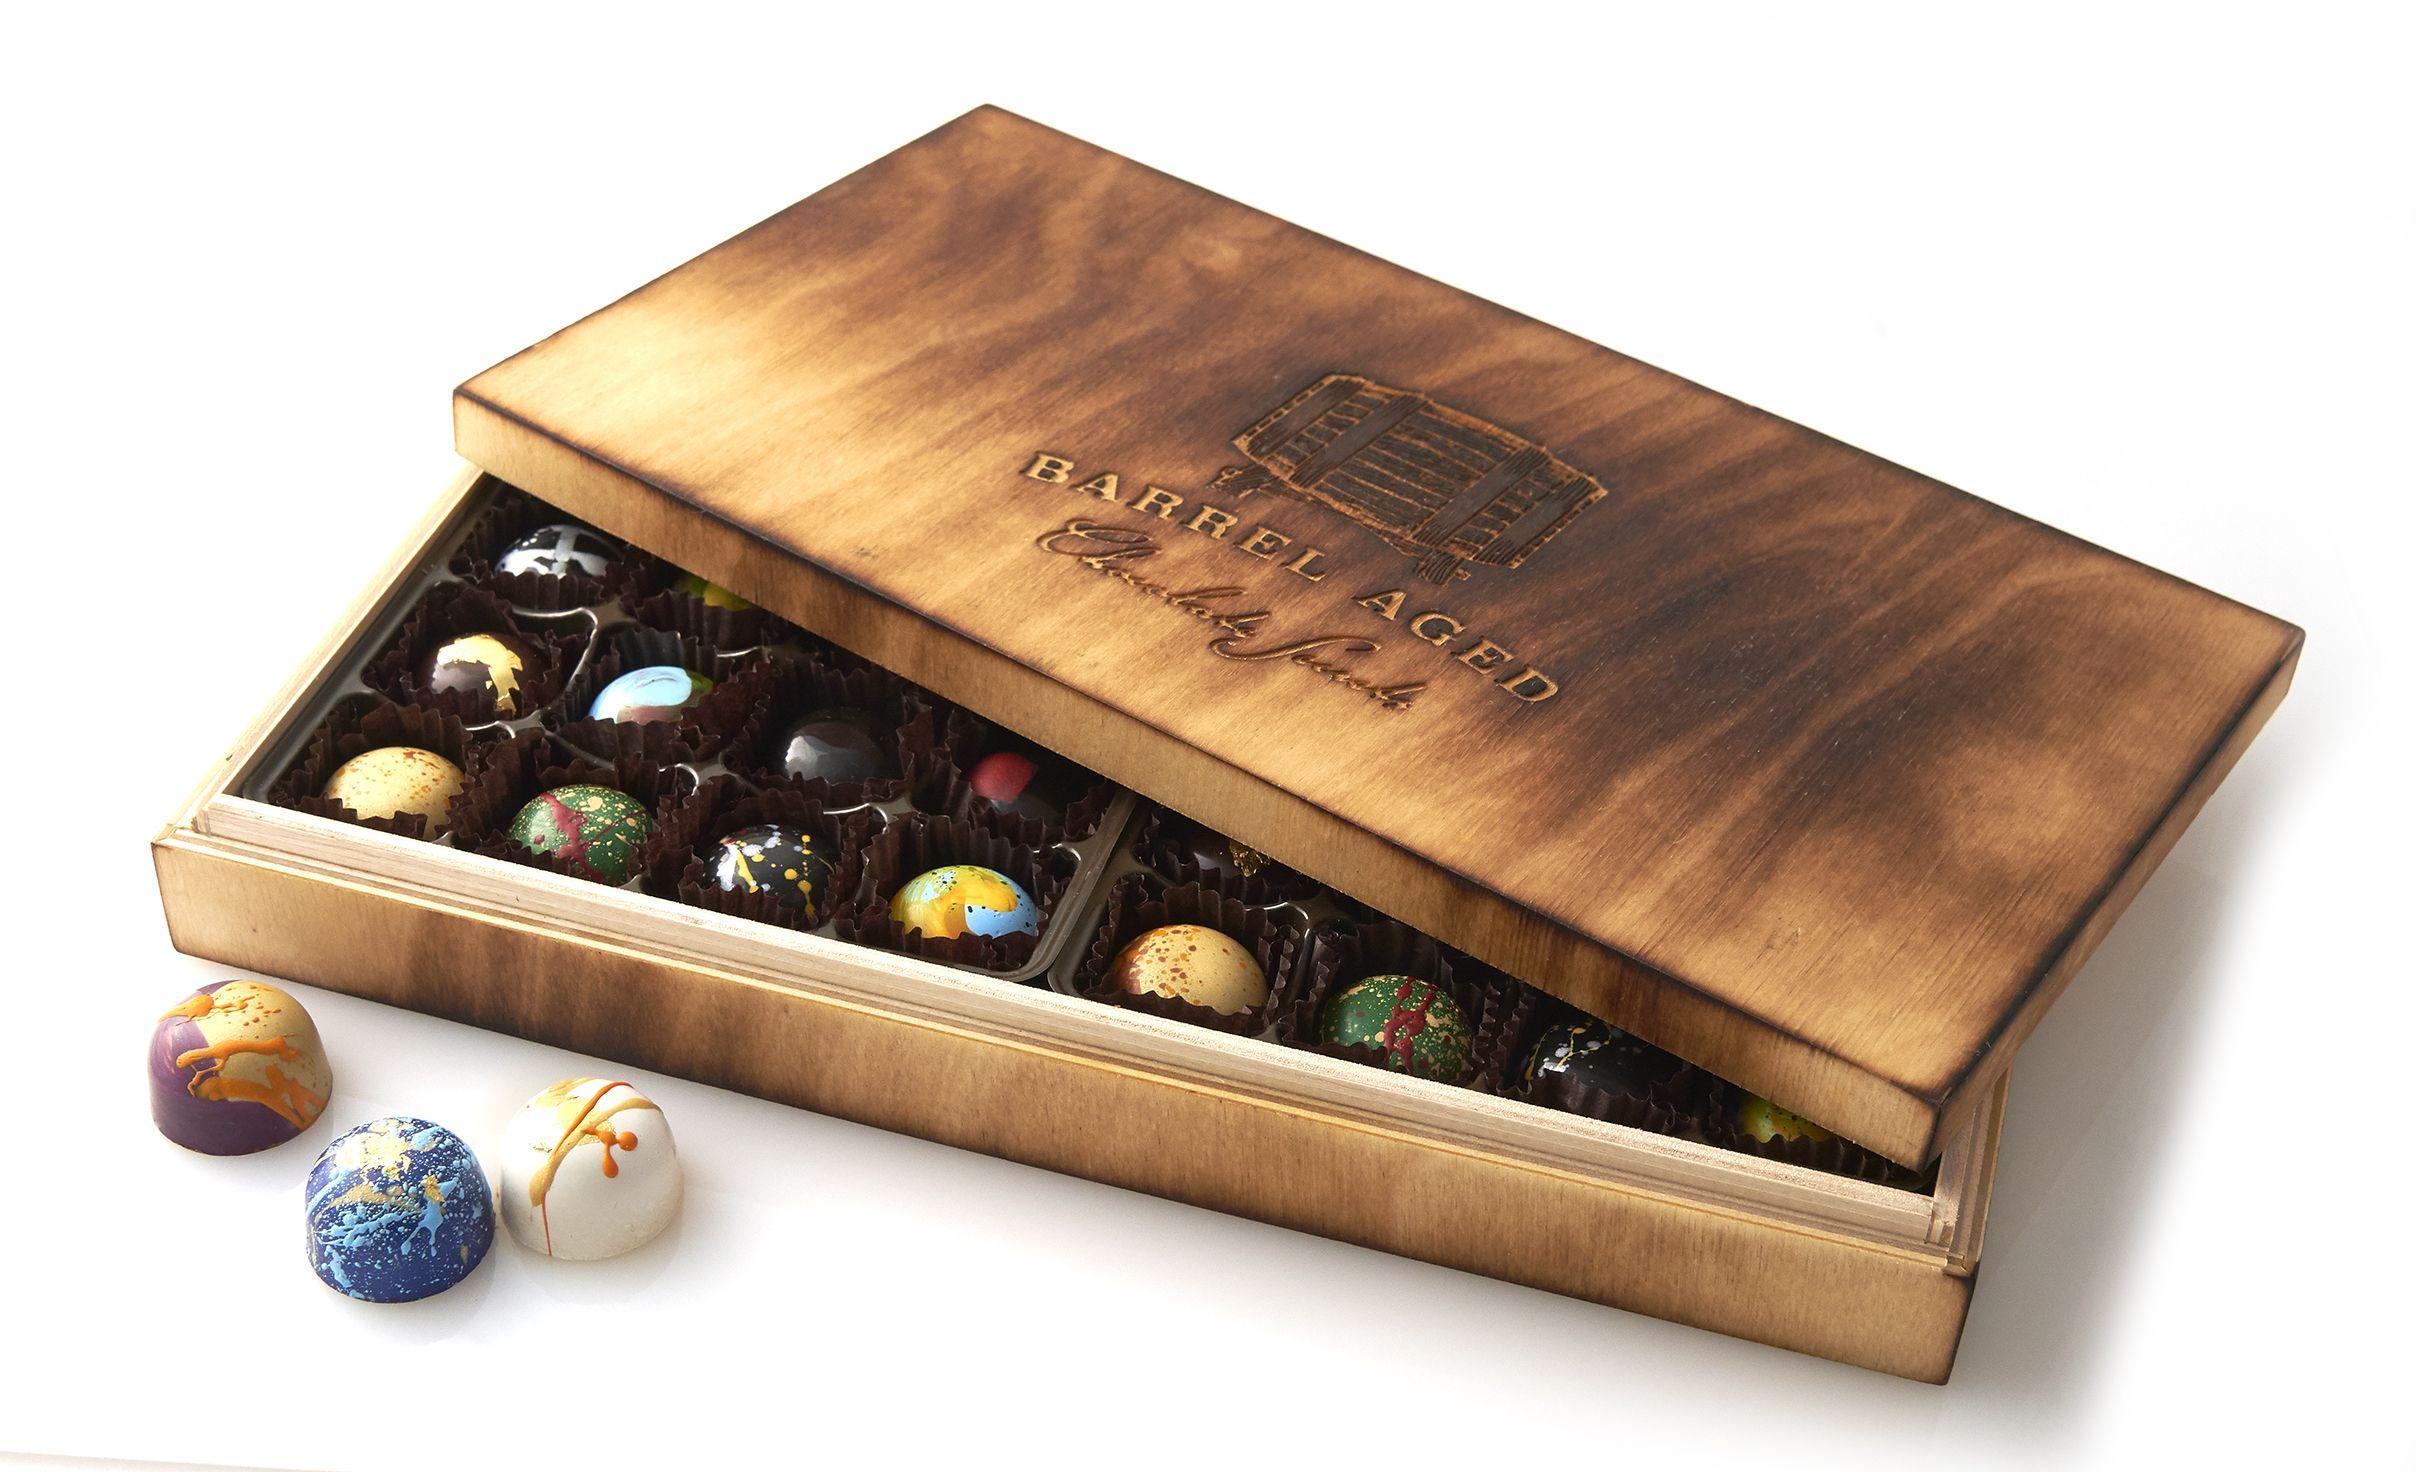 32 Piece Barrel Aged Handcrafted Bonbons, $145 @mychocolatesecrets.com